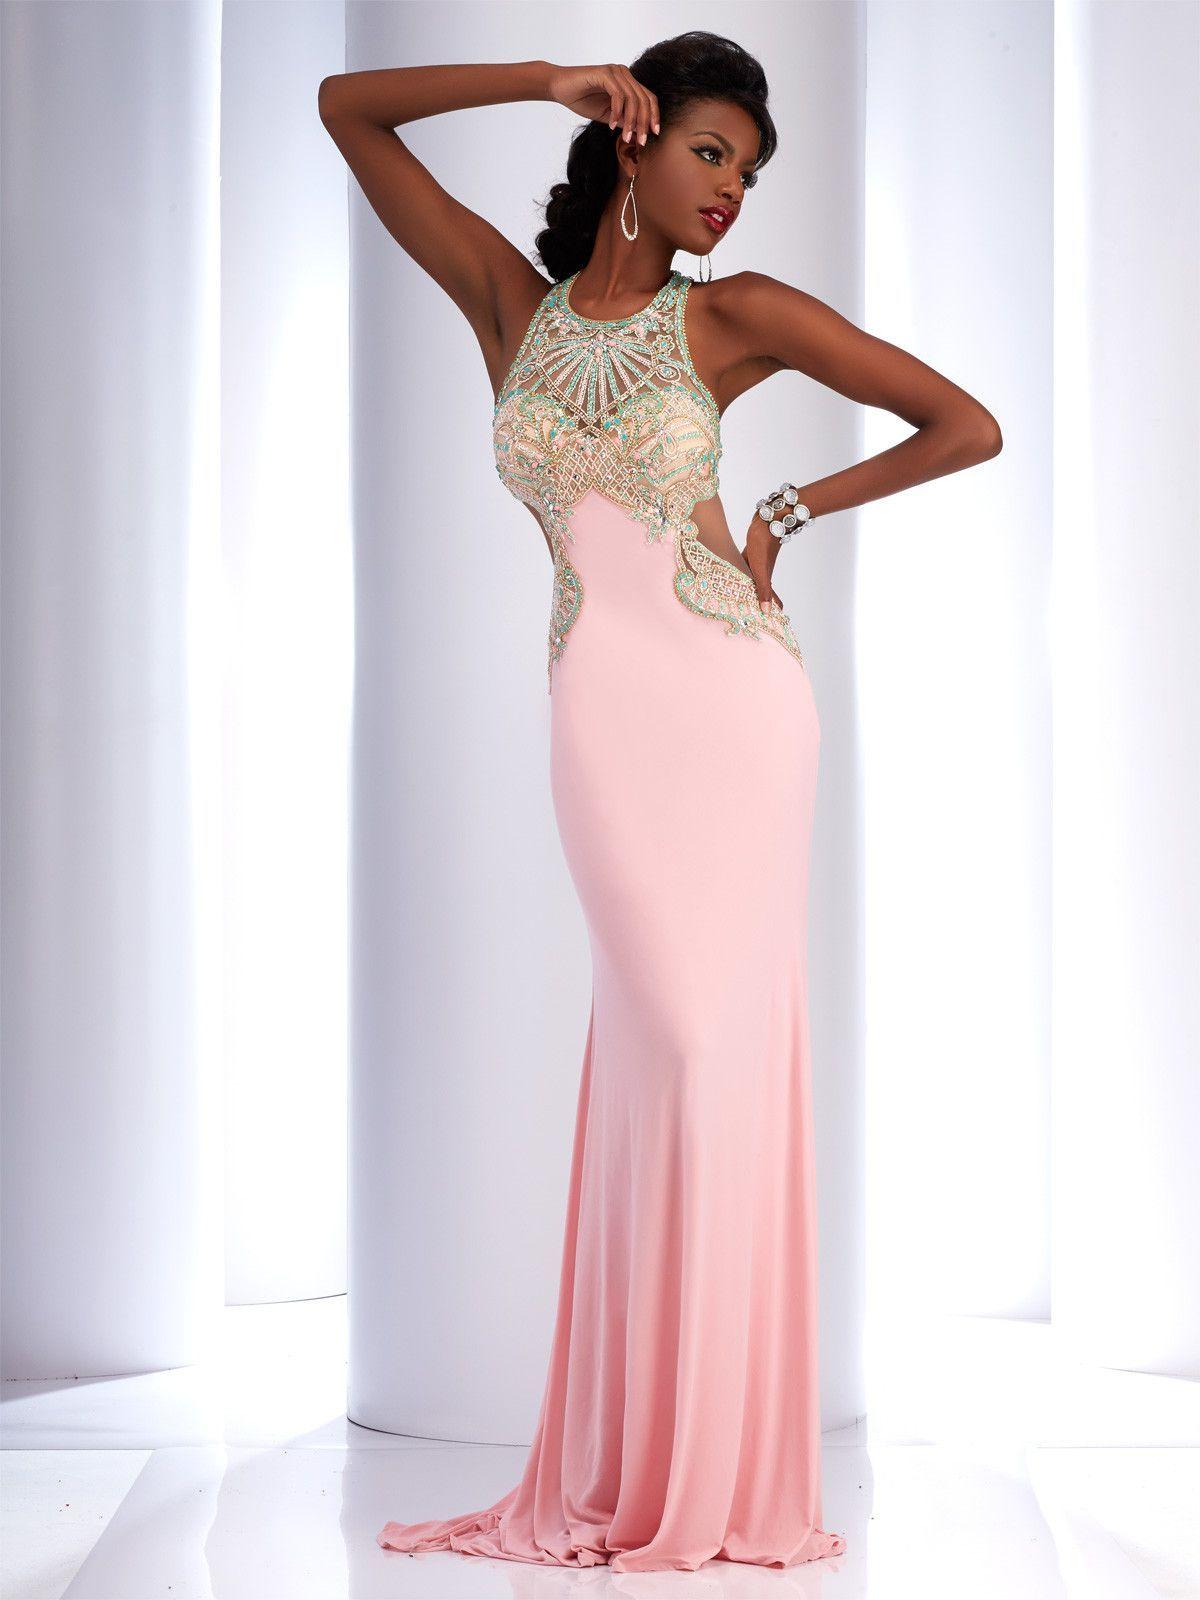 Clarisse 4738 Light Pink/Mint | PROM | Pinterest | Prom, Designer ...